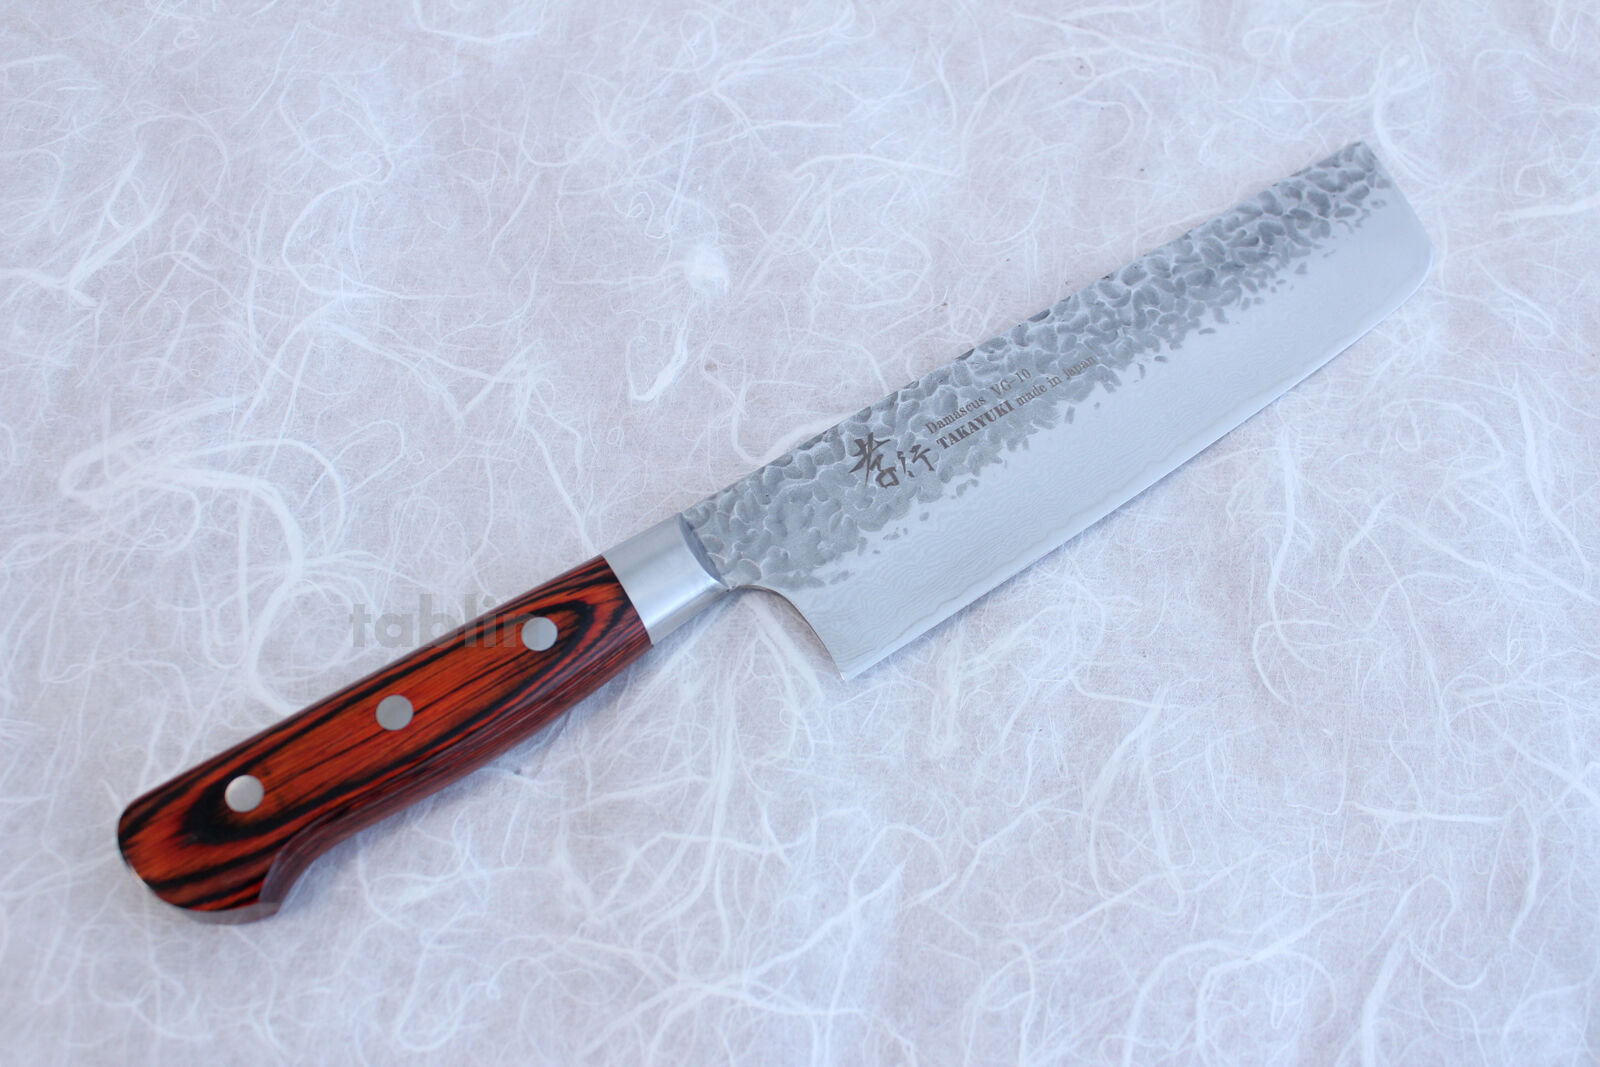 SAKAI TAKAYUKI hammerouge Damascus 33 layer VG-10 Japanese Nakiri knife 160mm